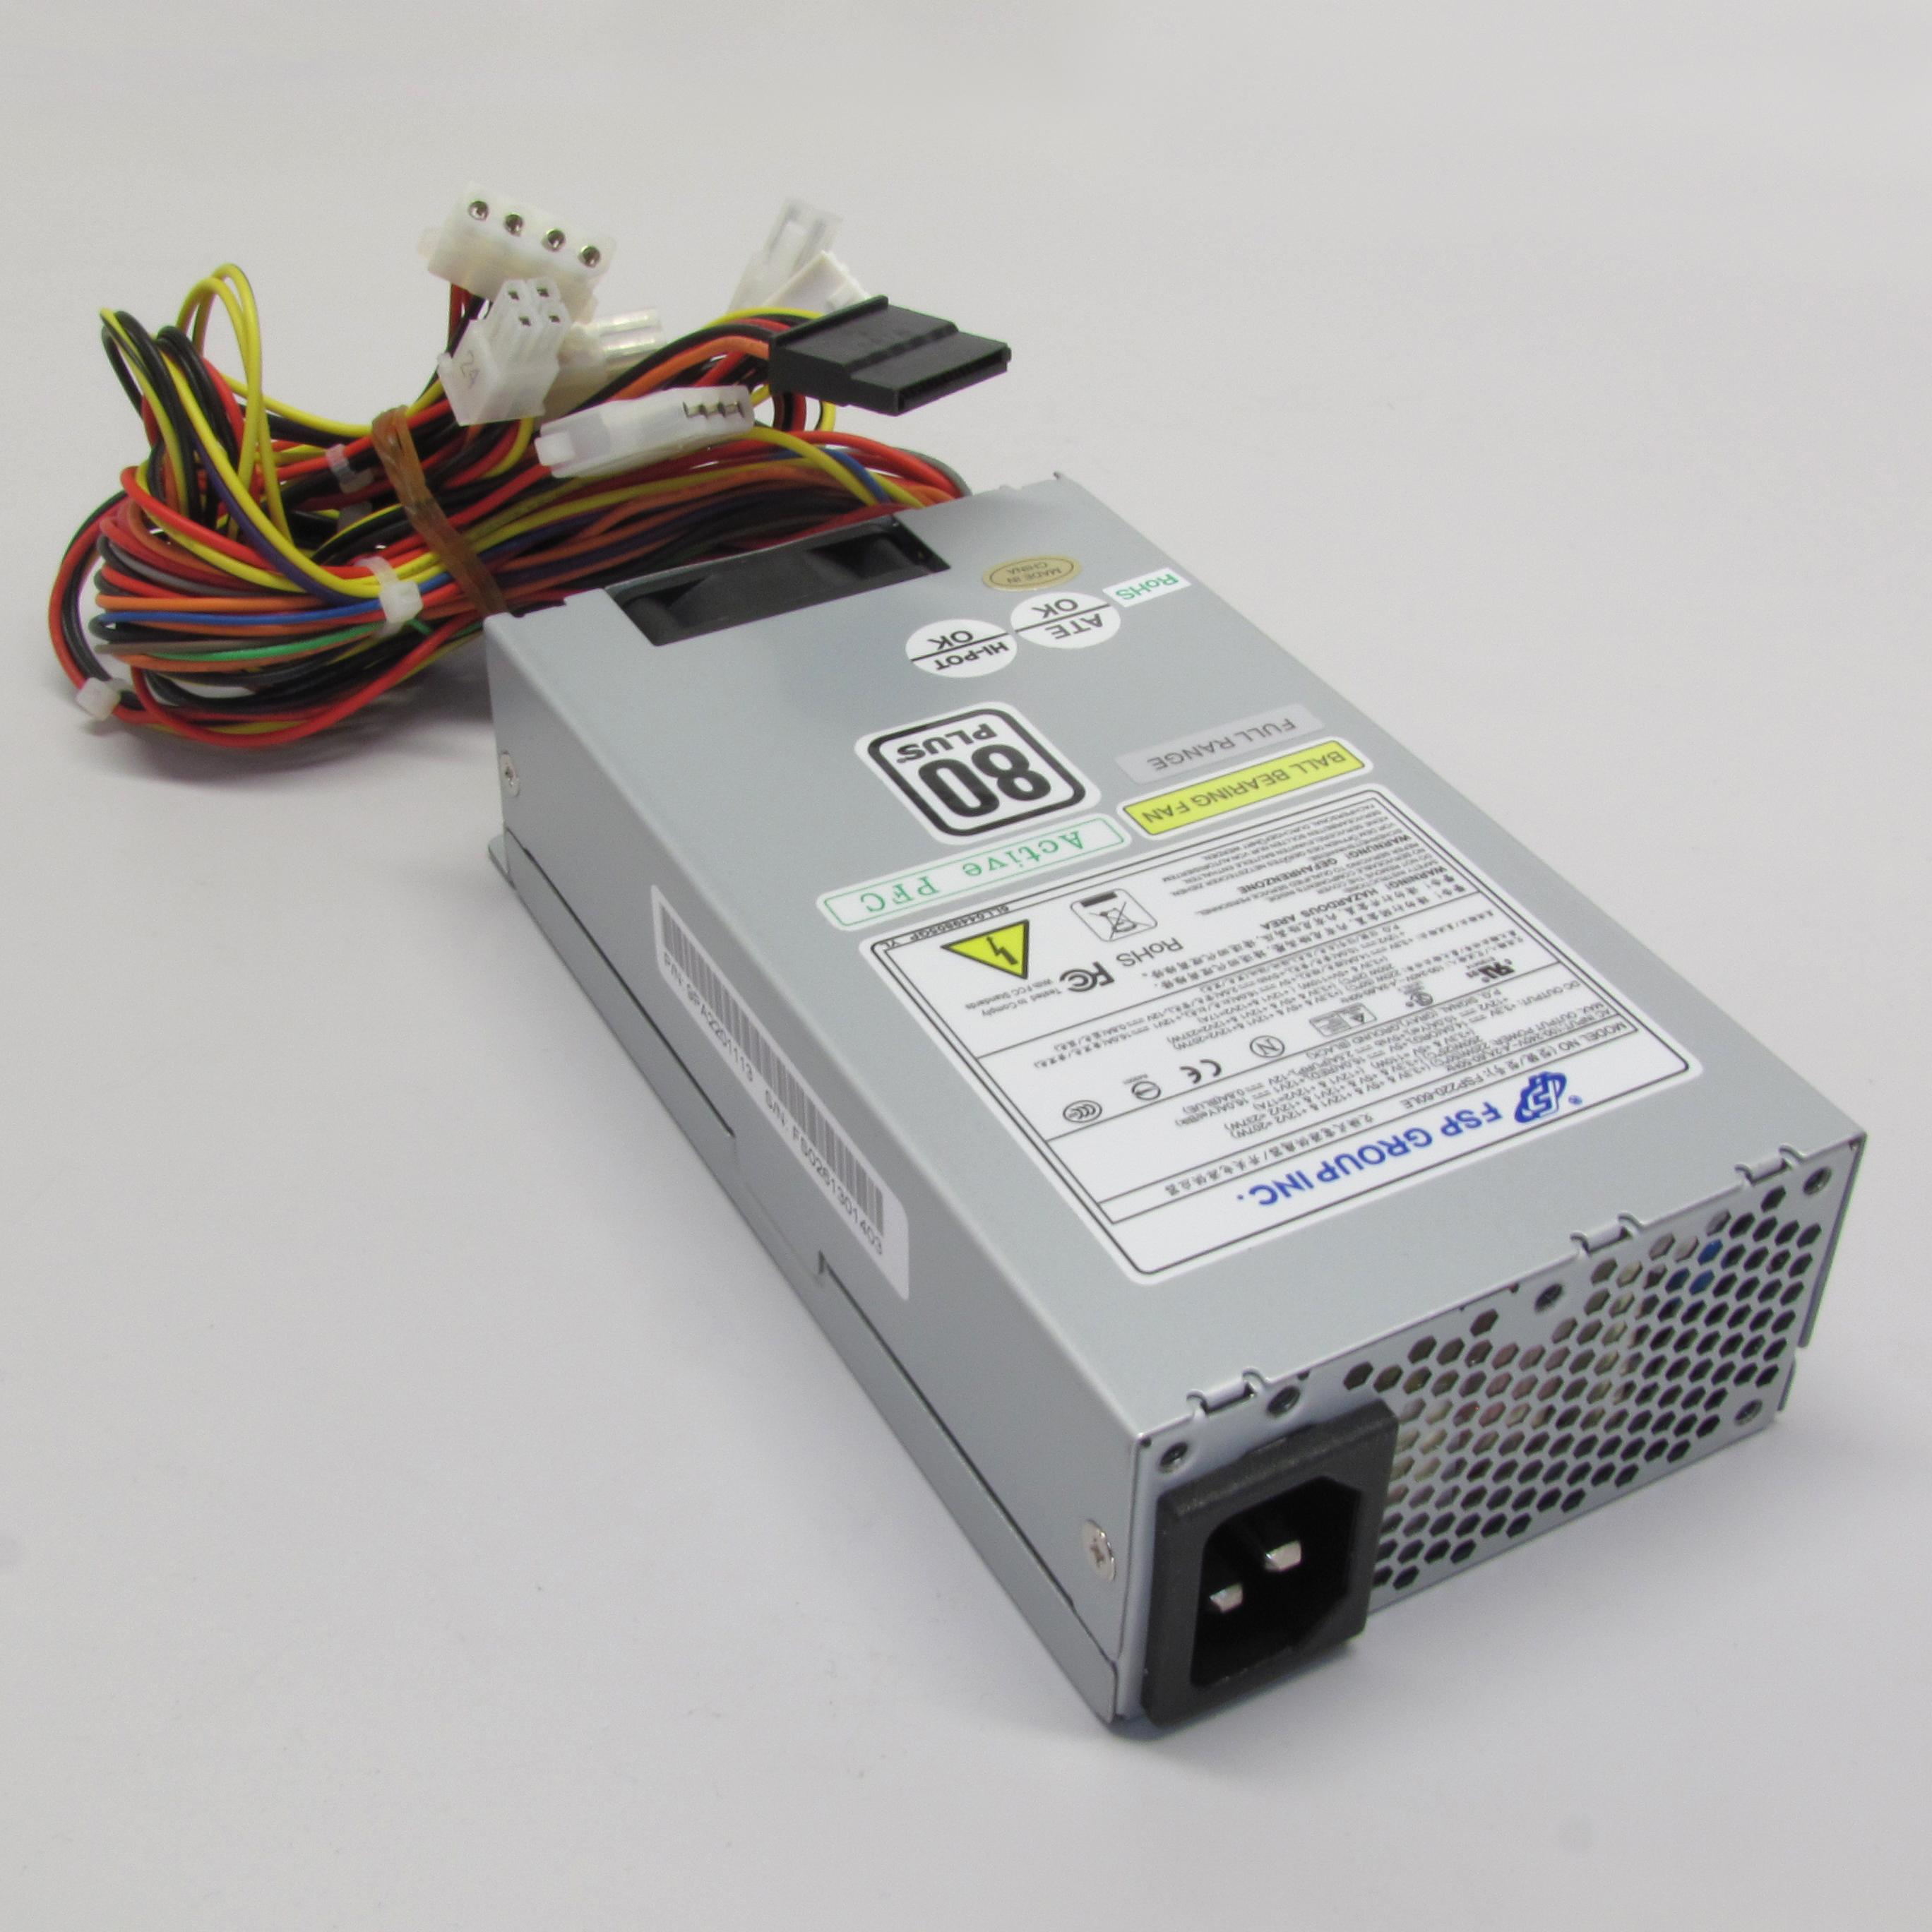 zdroj FSP220-60LE 1U AC/DC vstup 230V AC 220W